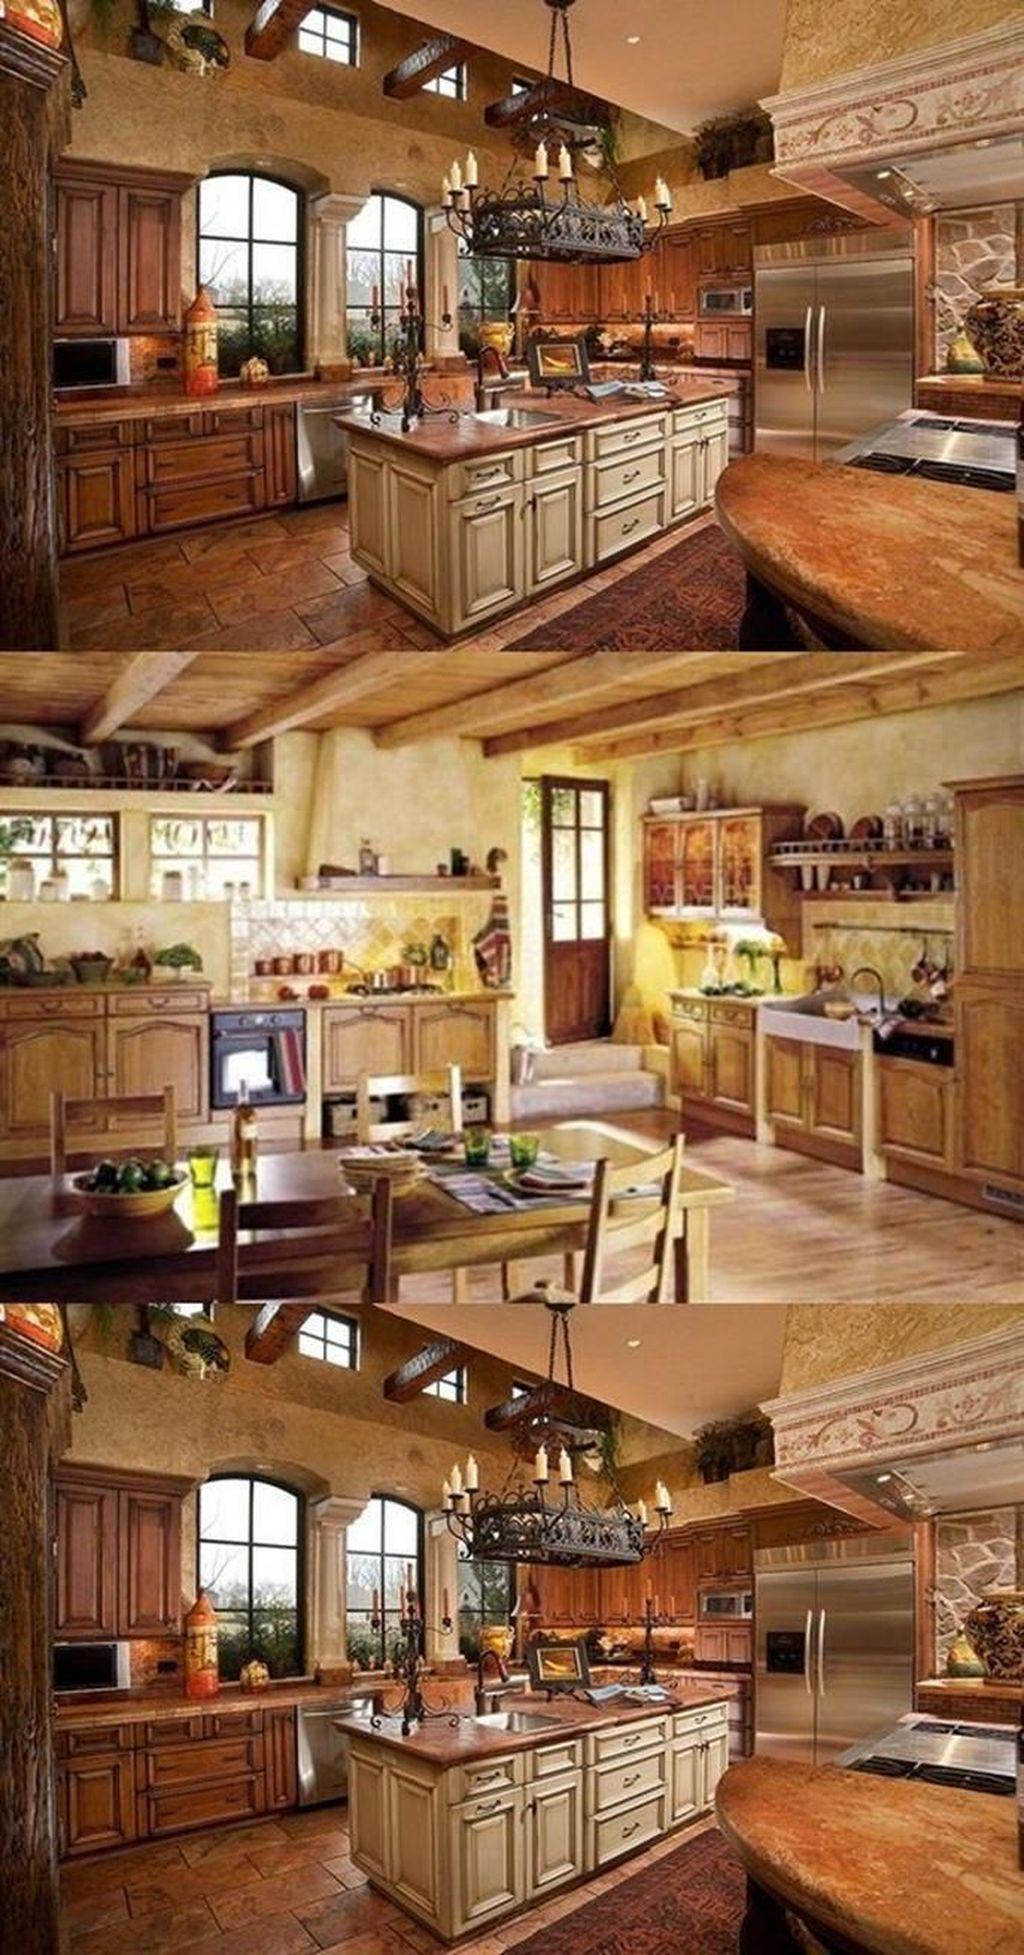 amazing italian style kitchen decor ideas for inspiration